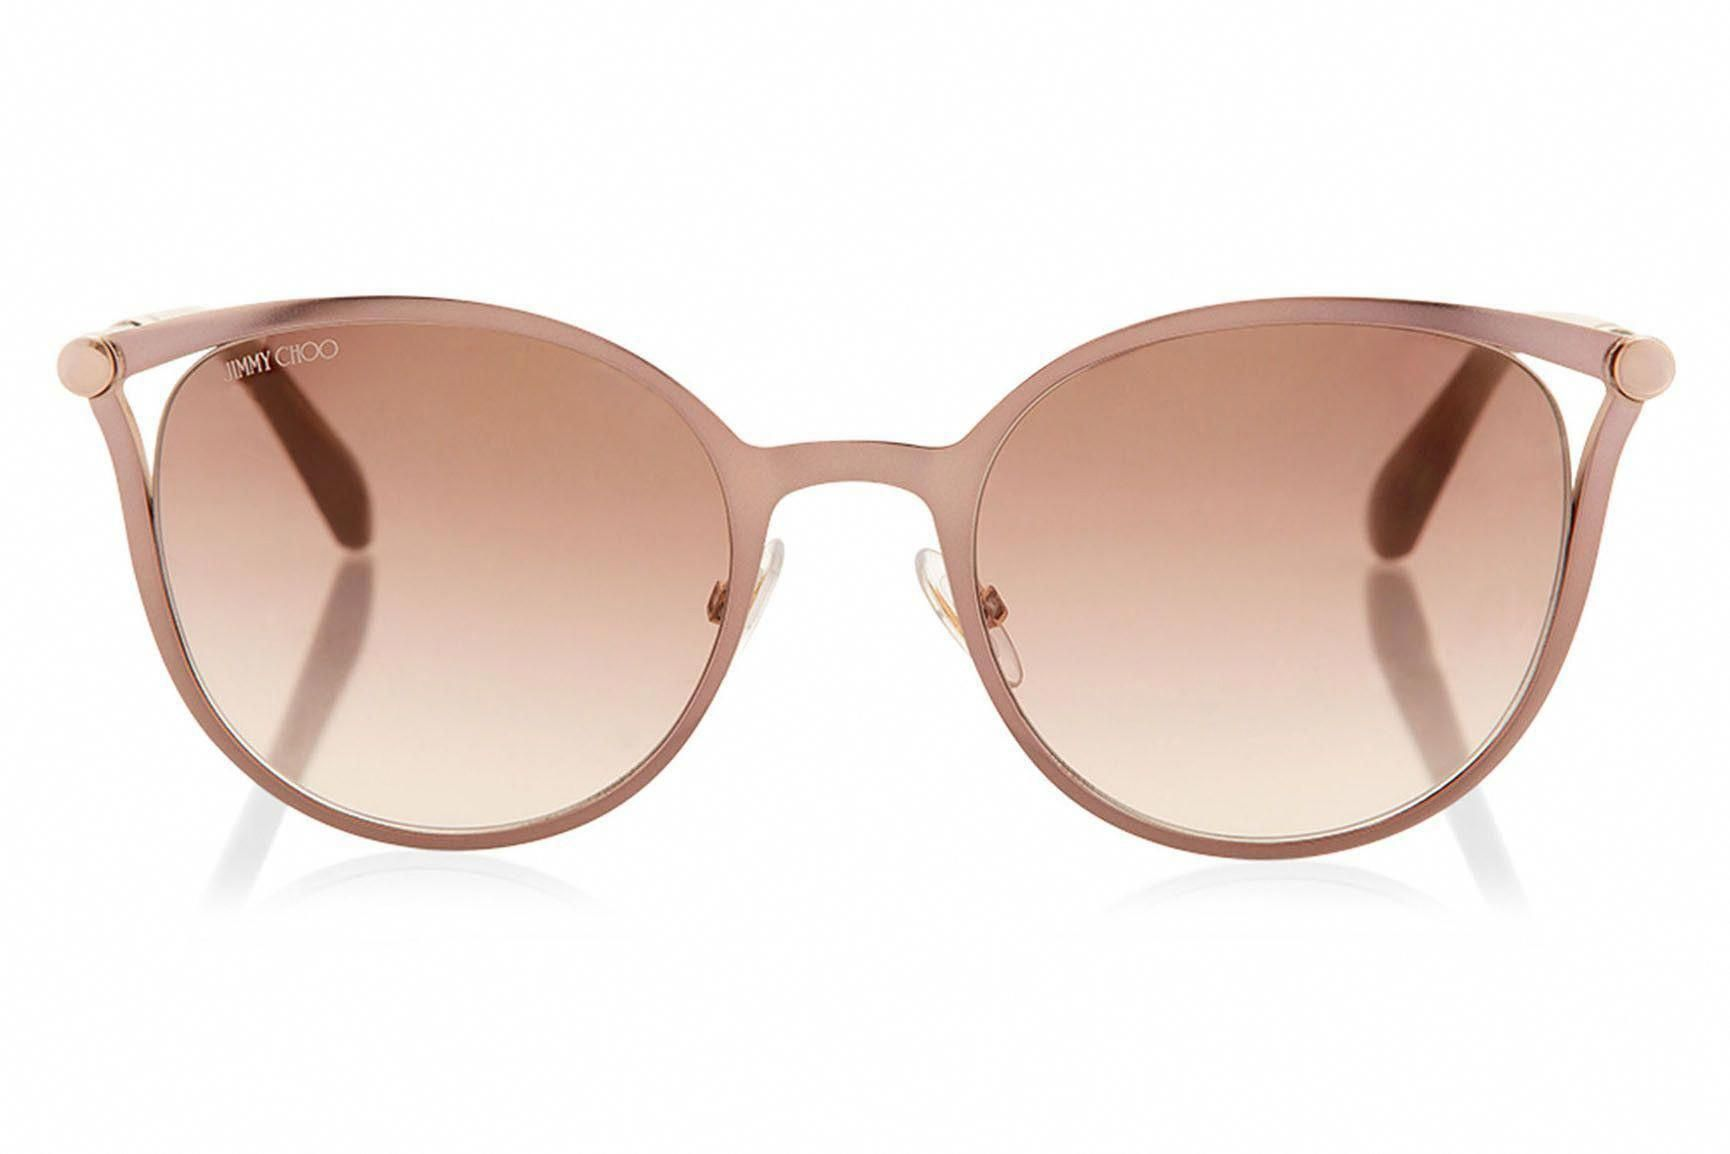 44844d0a7f Jimmy Choo - Neiza Brown Rose Gold Cat-Eye Sunglasses  JimmyChoo ...